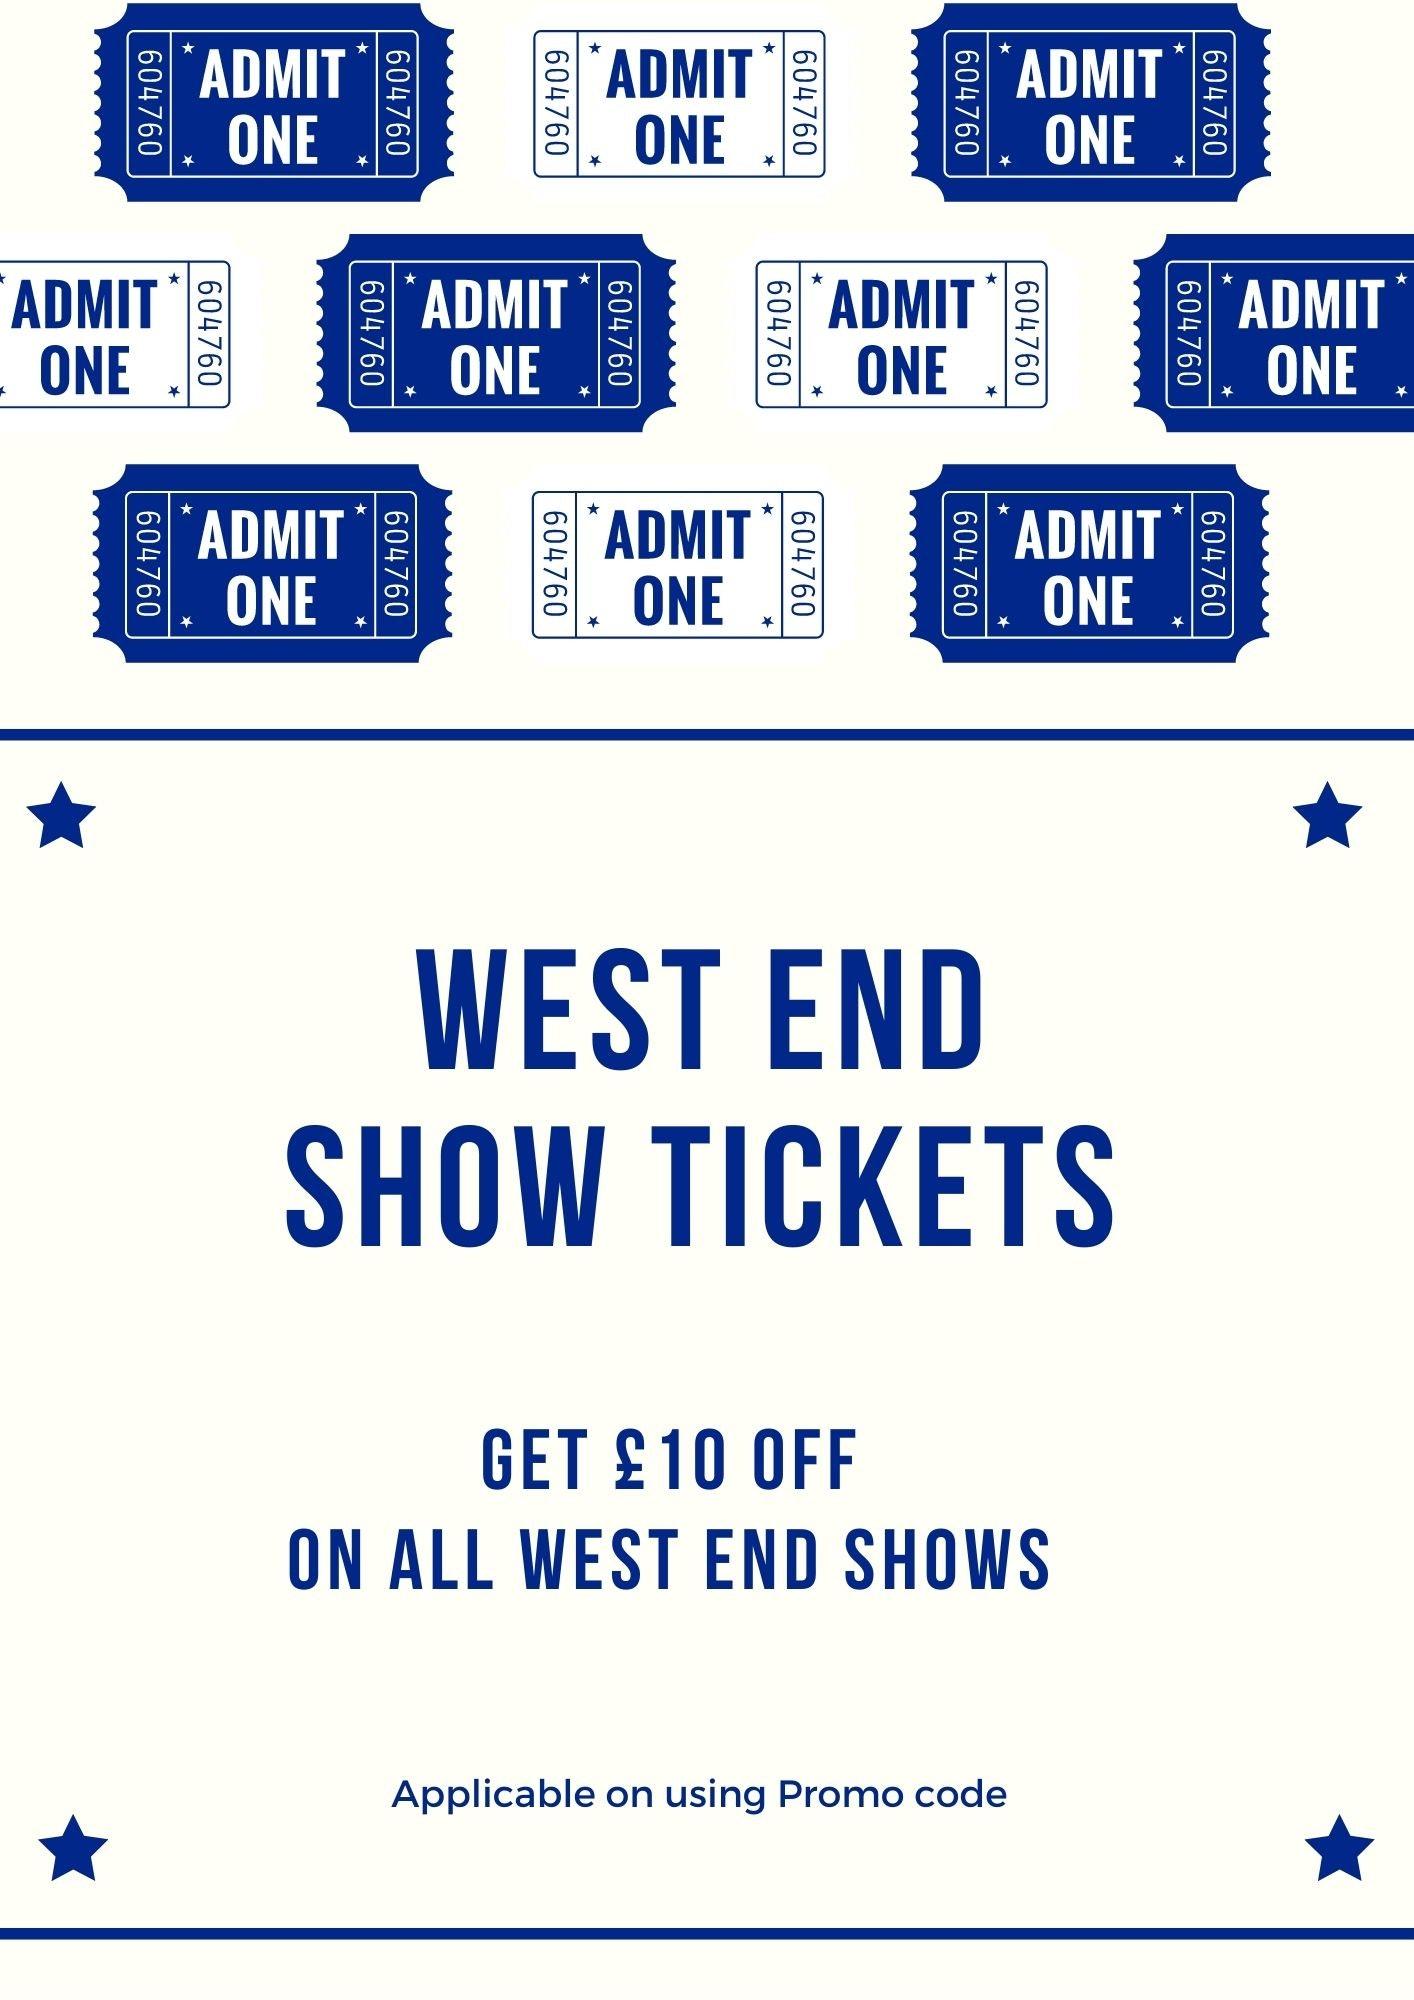 West End show ticket discounts